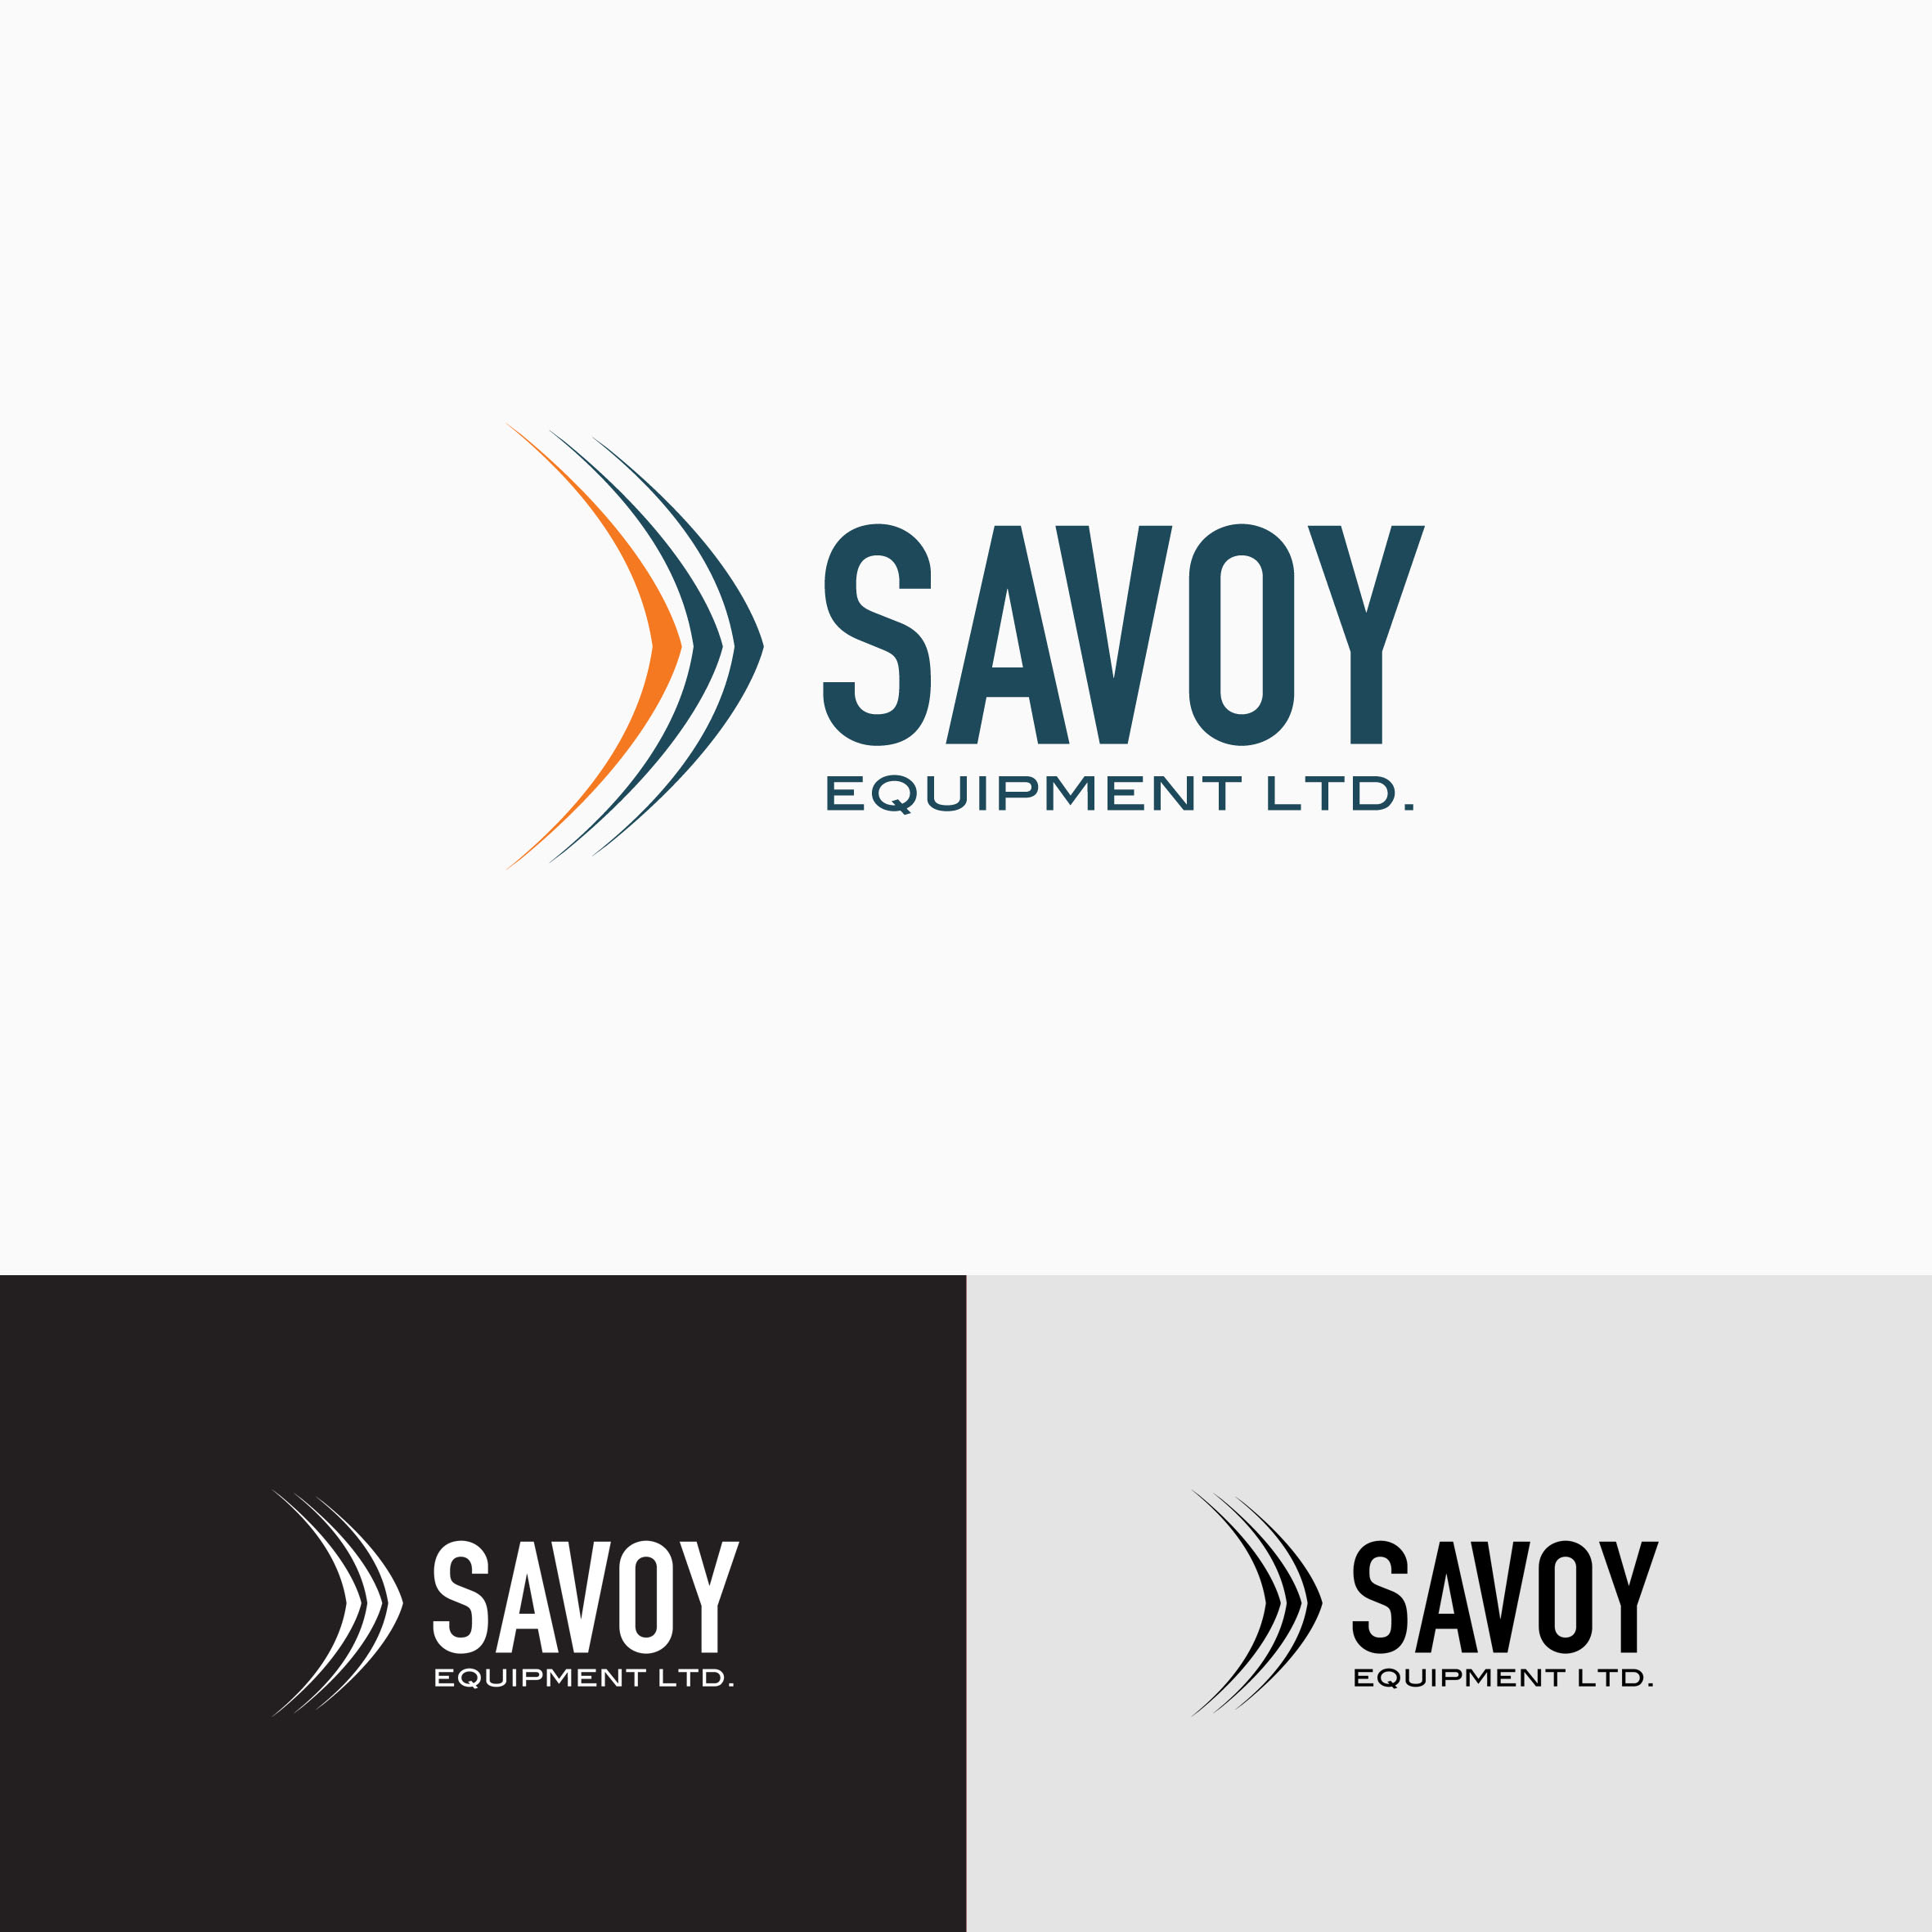 Logo Design by tanganpanas - Entry No. 27 in the Logo Design Contest Inspiring Logo Design for Savoy Equipment Ltd..